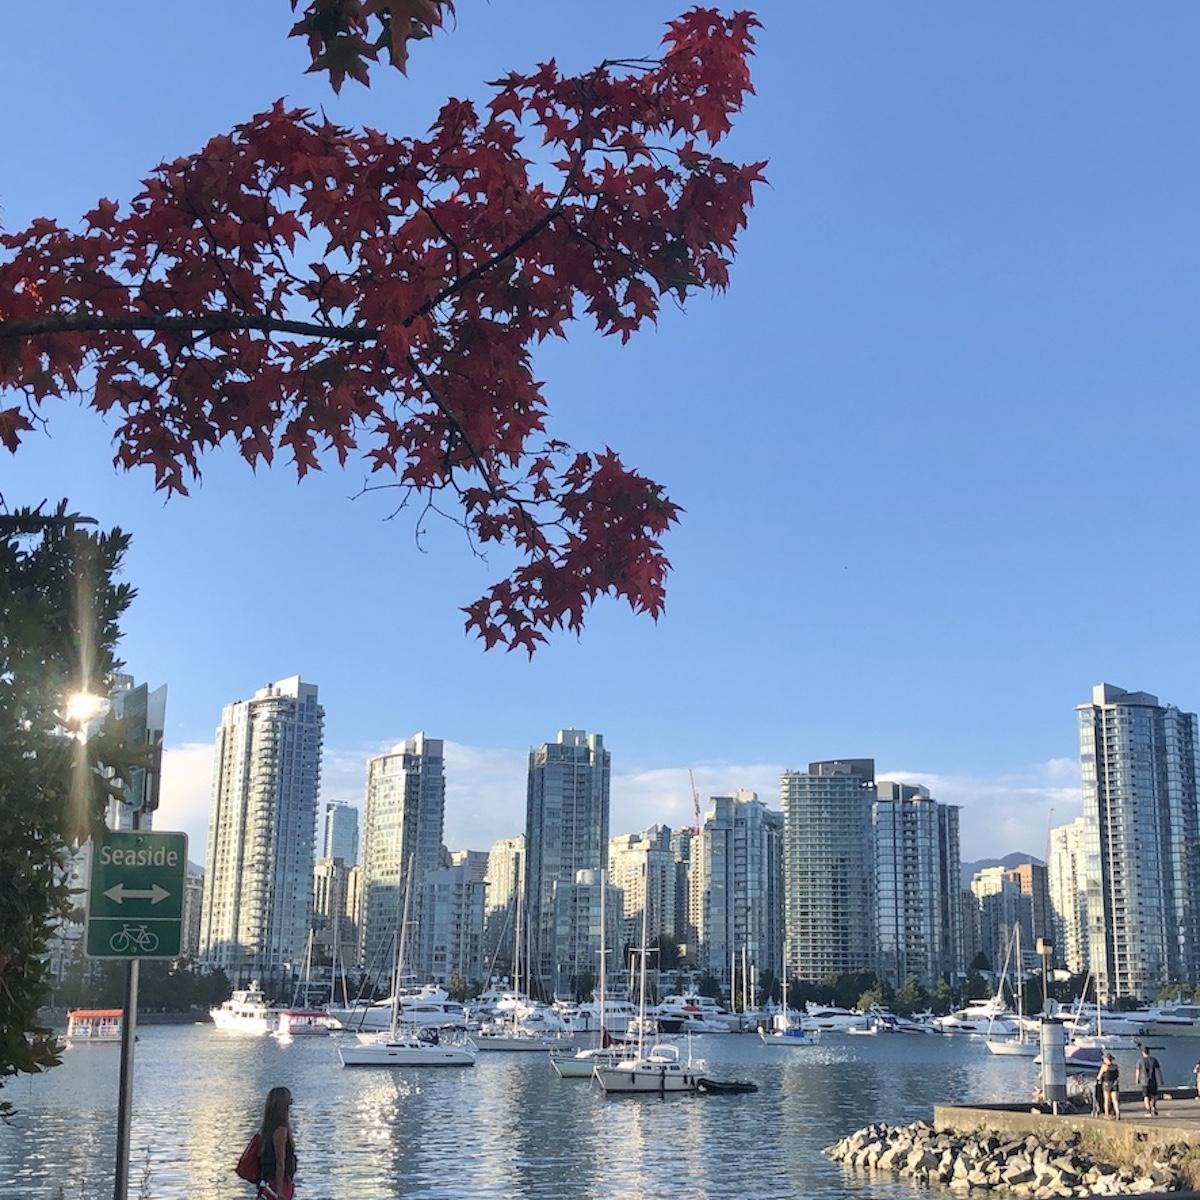 Vancouver skyline - Seaside paths